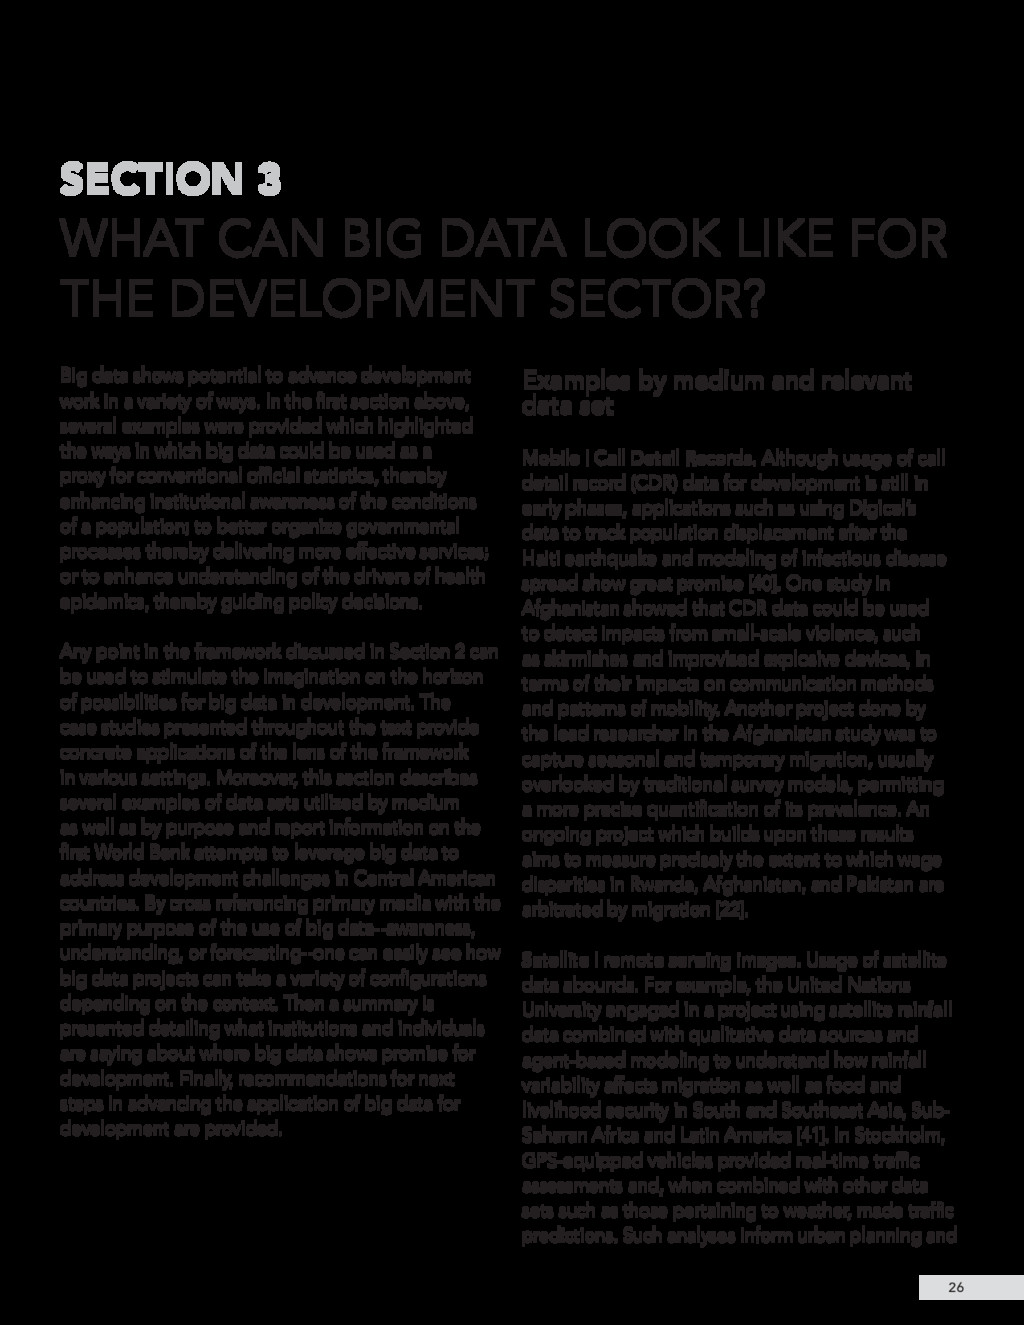 Big data shows potential to advance development...